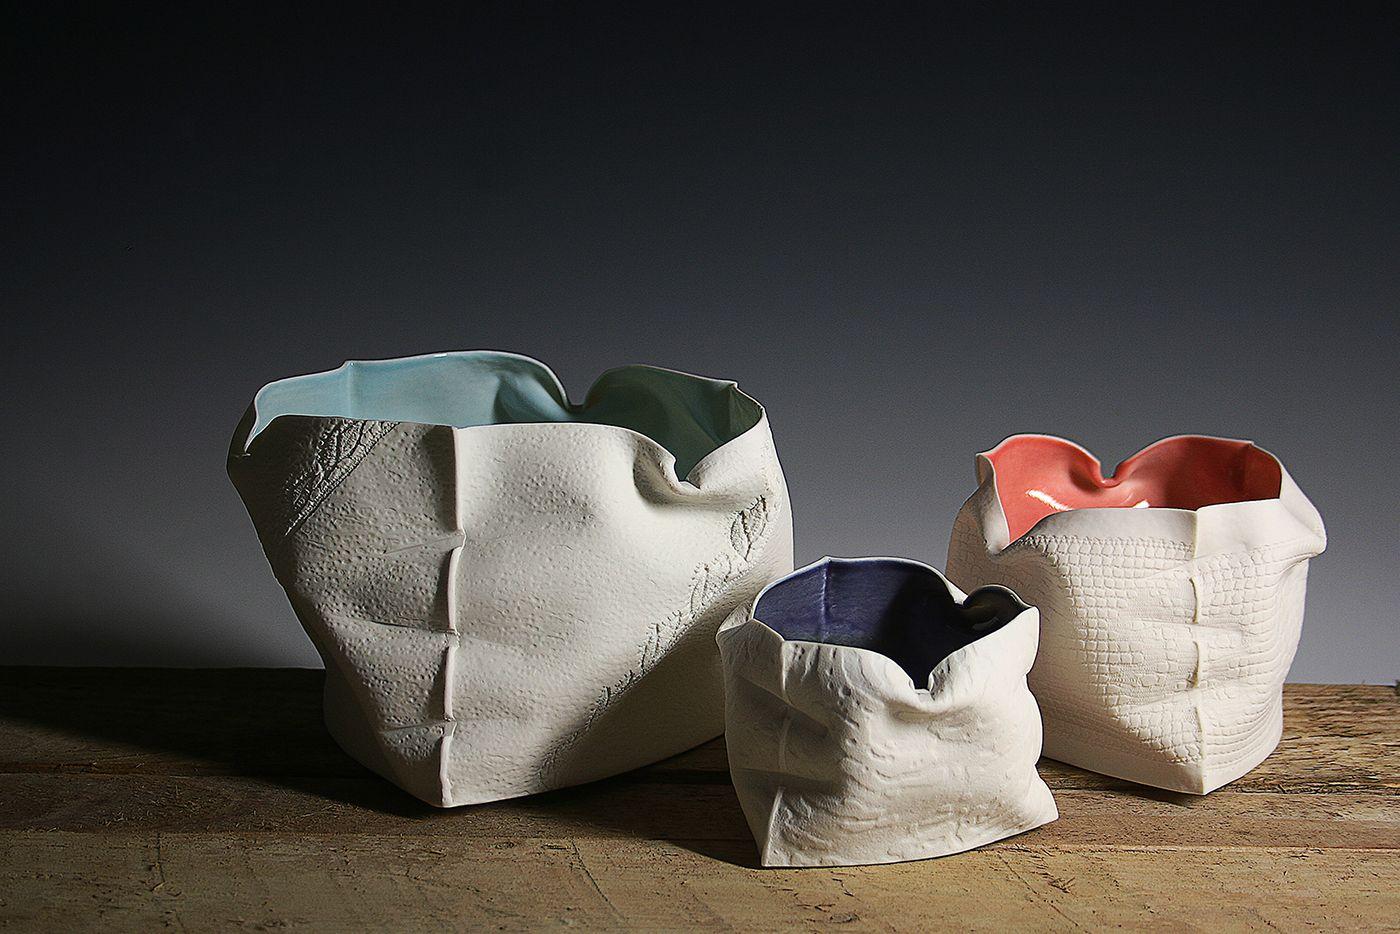 Louise Hall 3 300 B 3 Jpg 1 400 934 Pixels Lace Wallpaper Ceramics Pottery